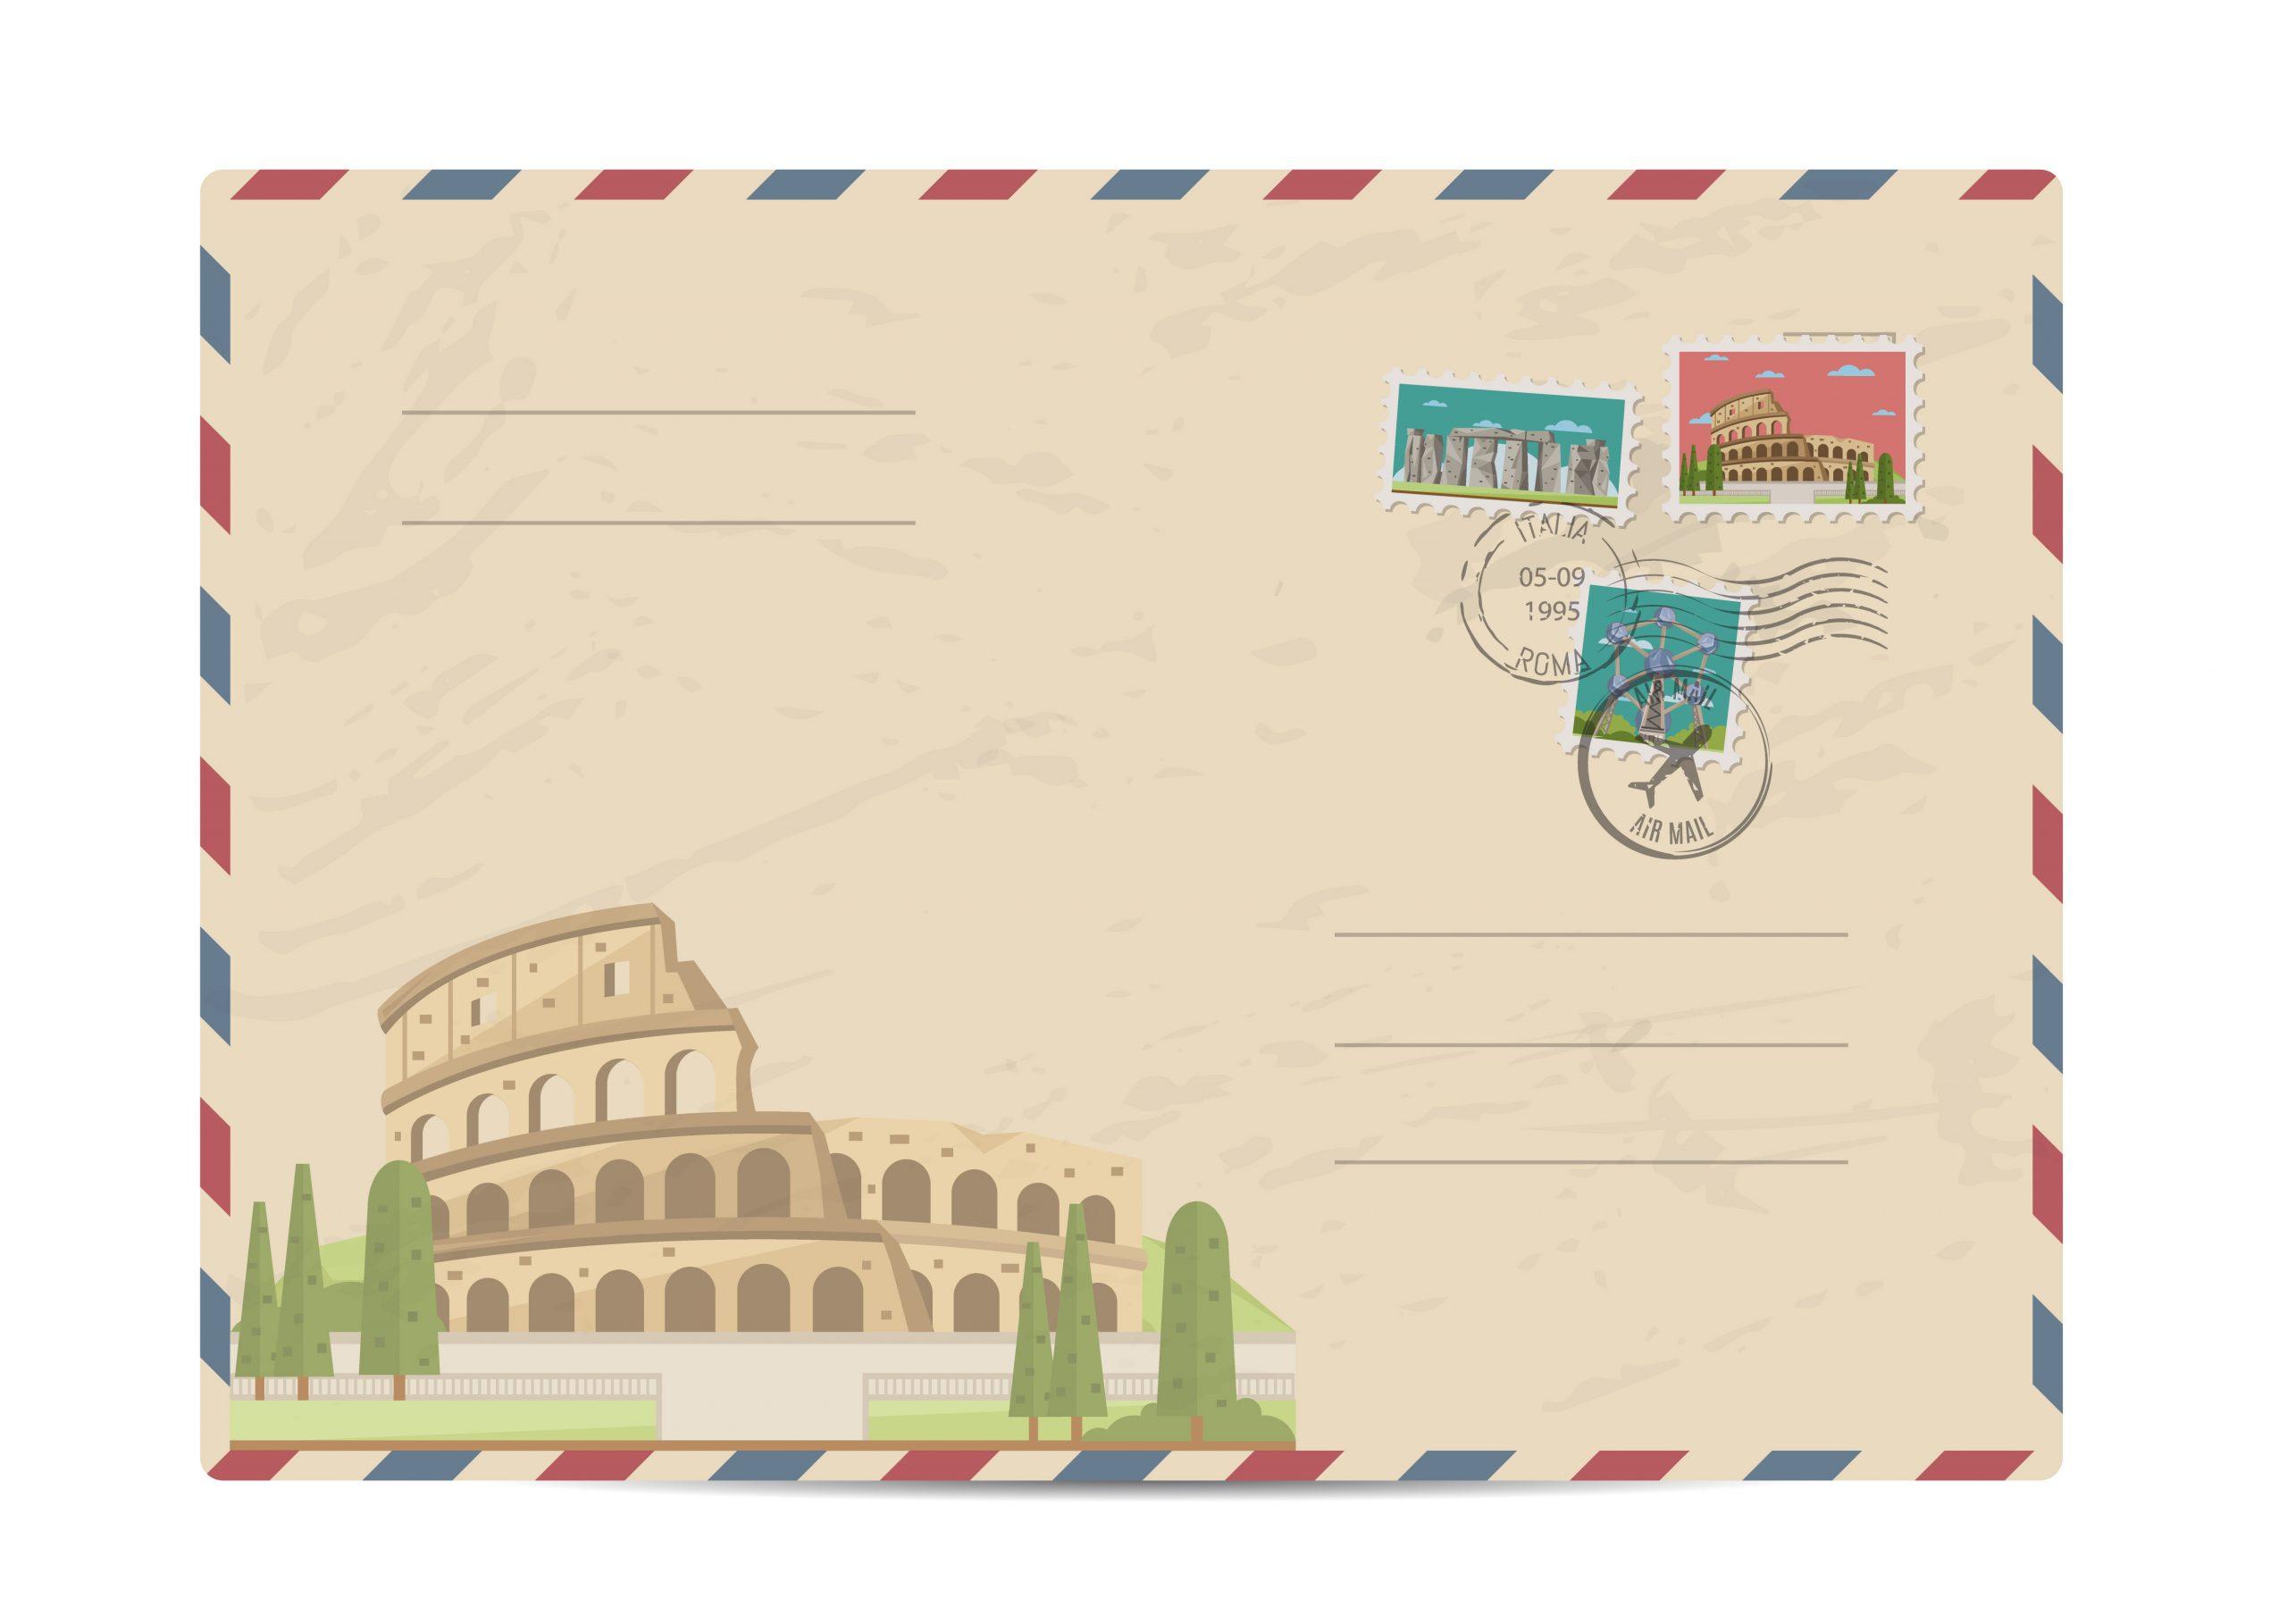 journaling in Italian